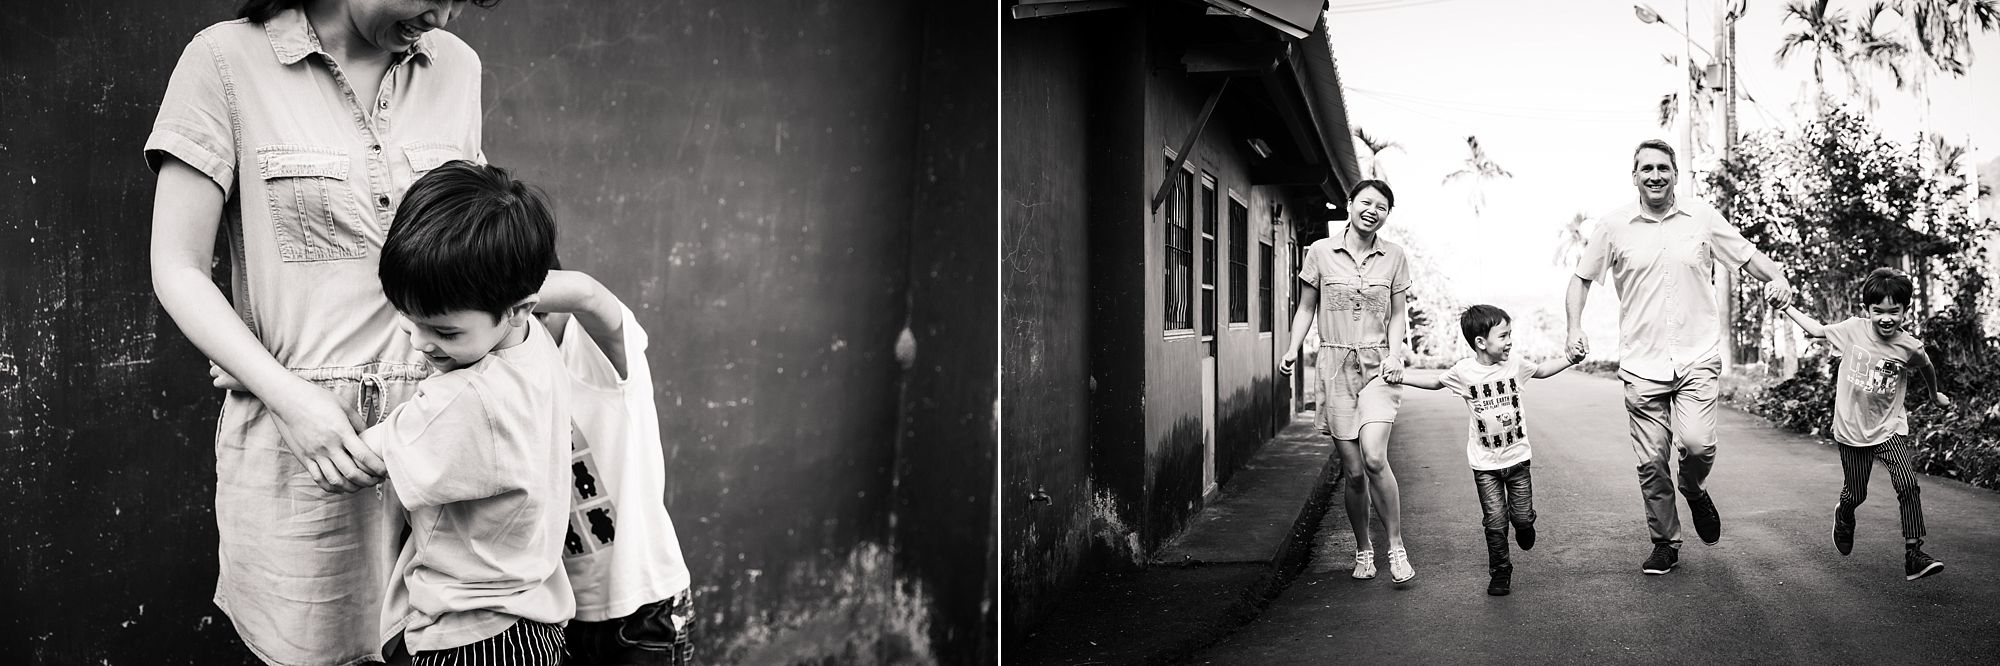 Taiwan_Family_Lifestyle_Photographer_Hunnicutt_Photography_0004